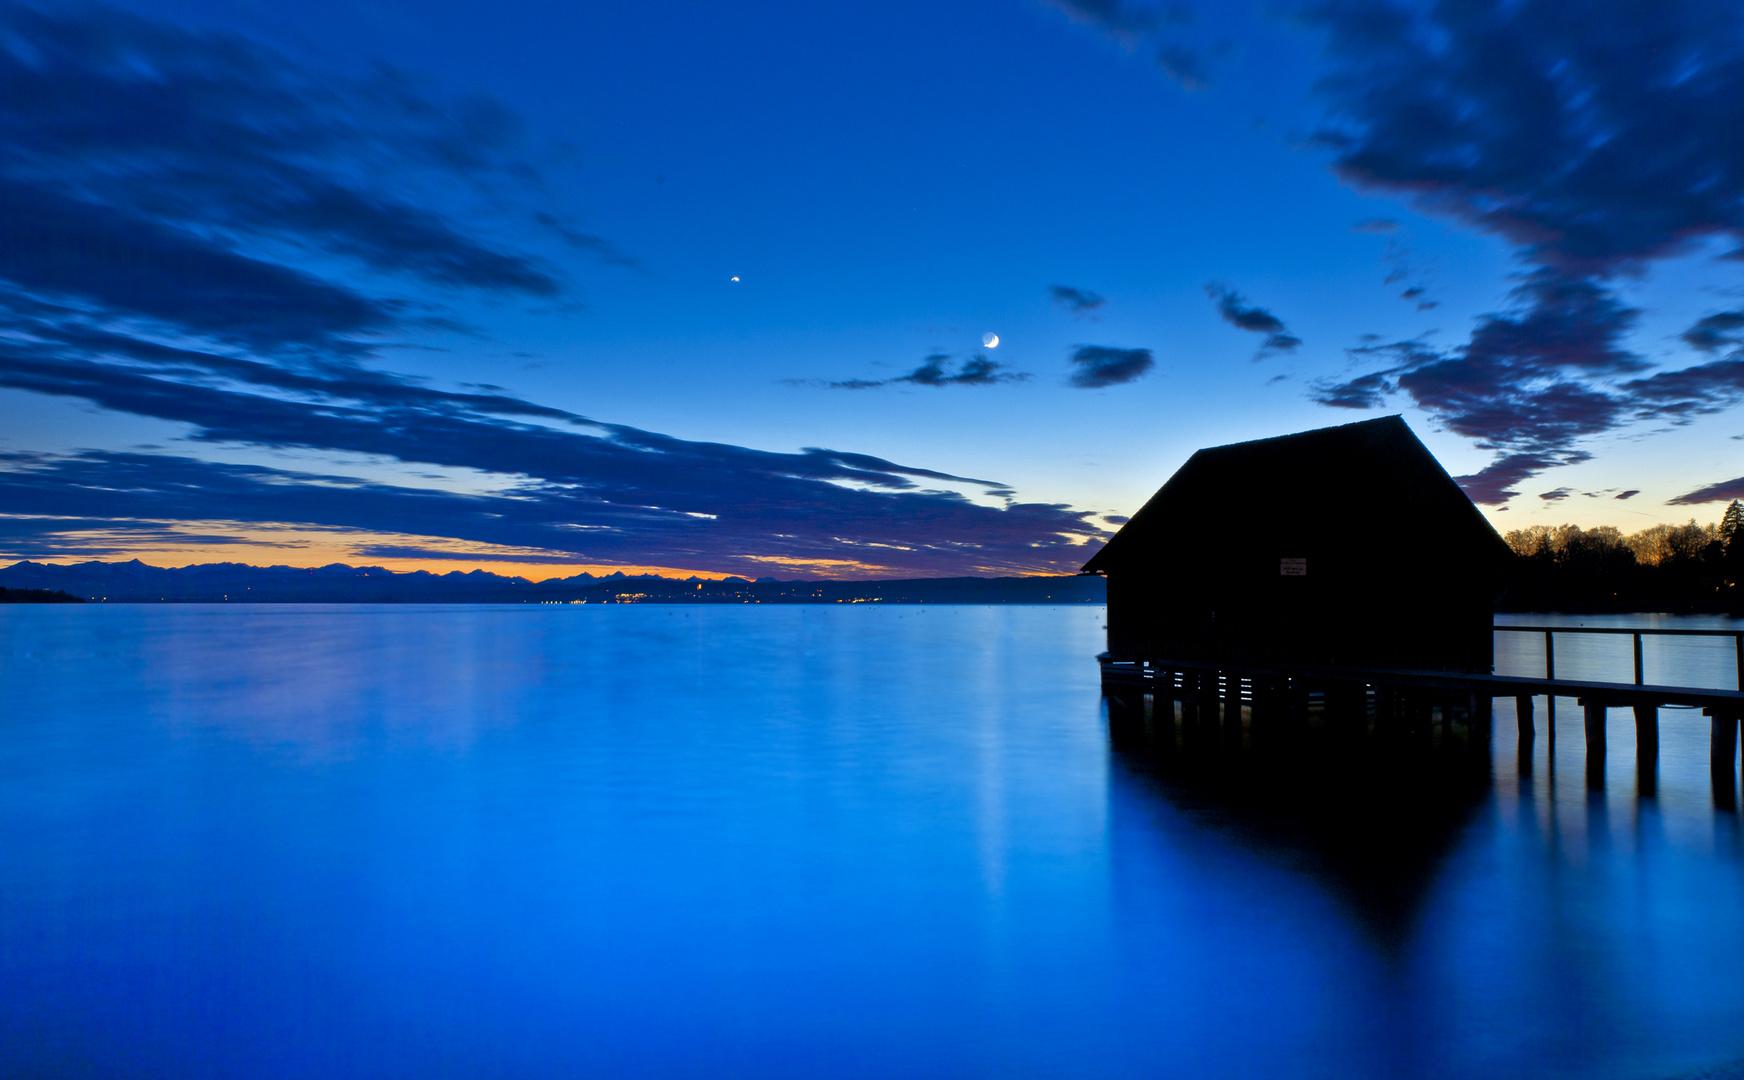 Blaue Stunde am Ammersee - heute